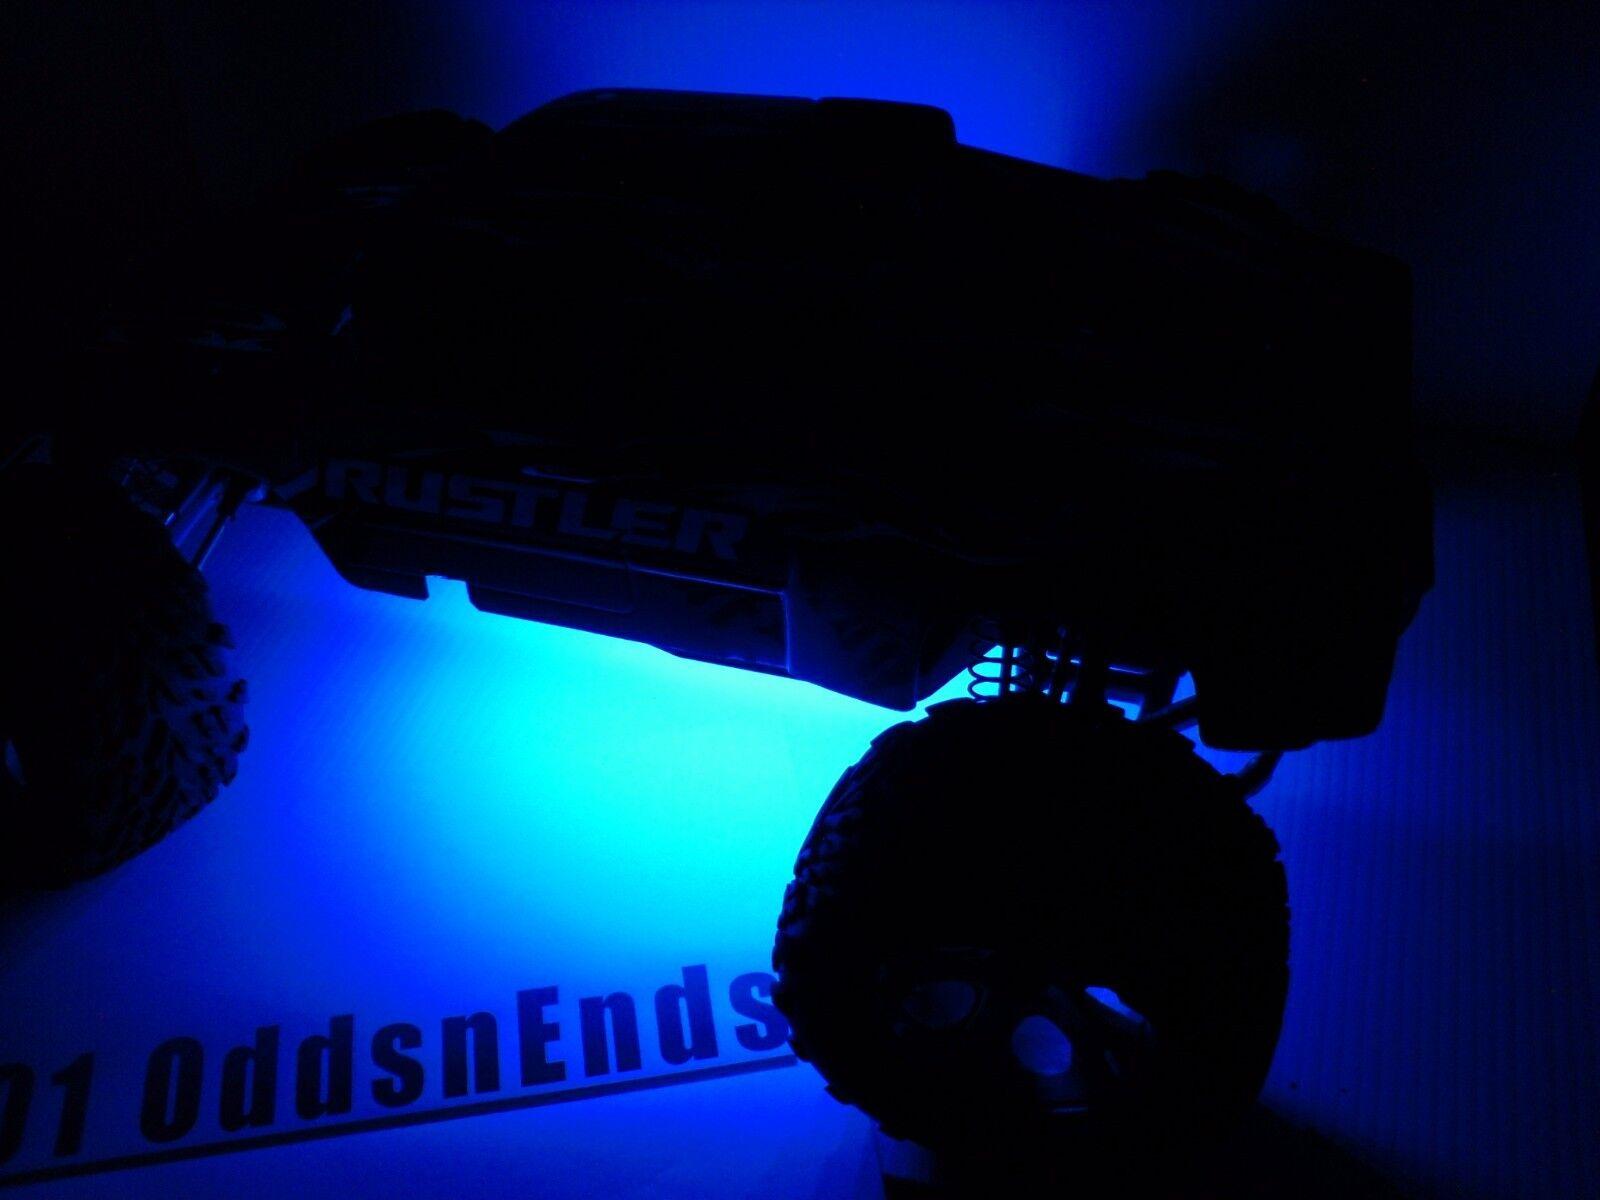 Blue traxxas rustler bandit universal 110 rc led strip lights plug picture 1 of 4 aloadofball Gallery